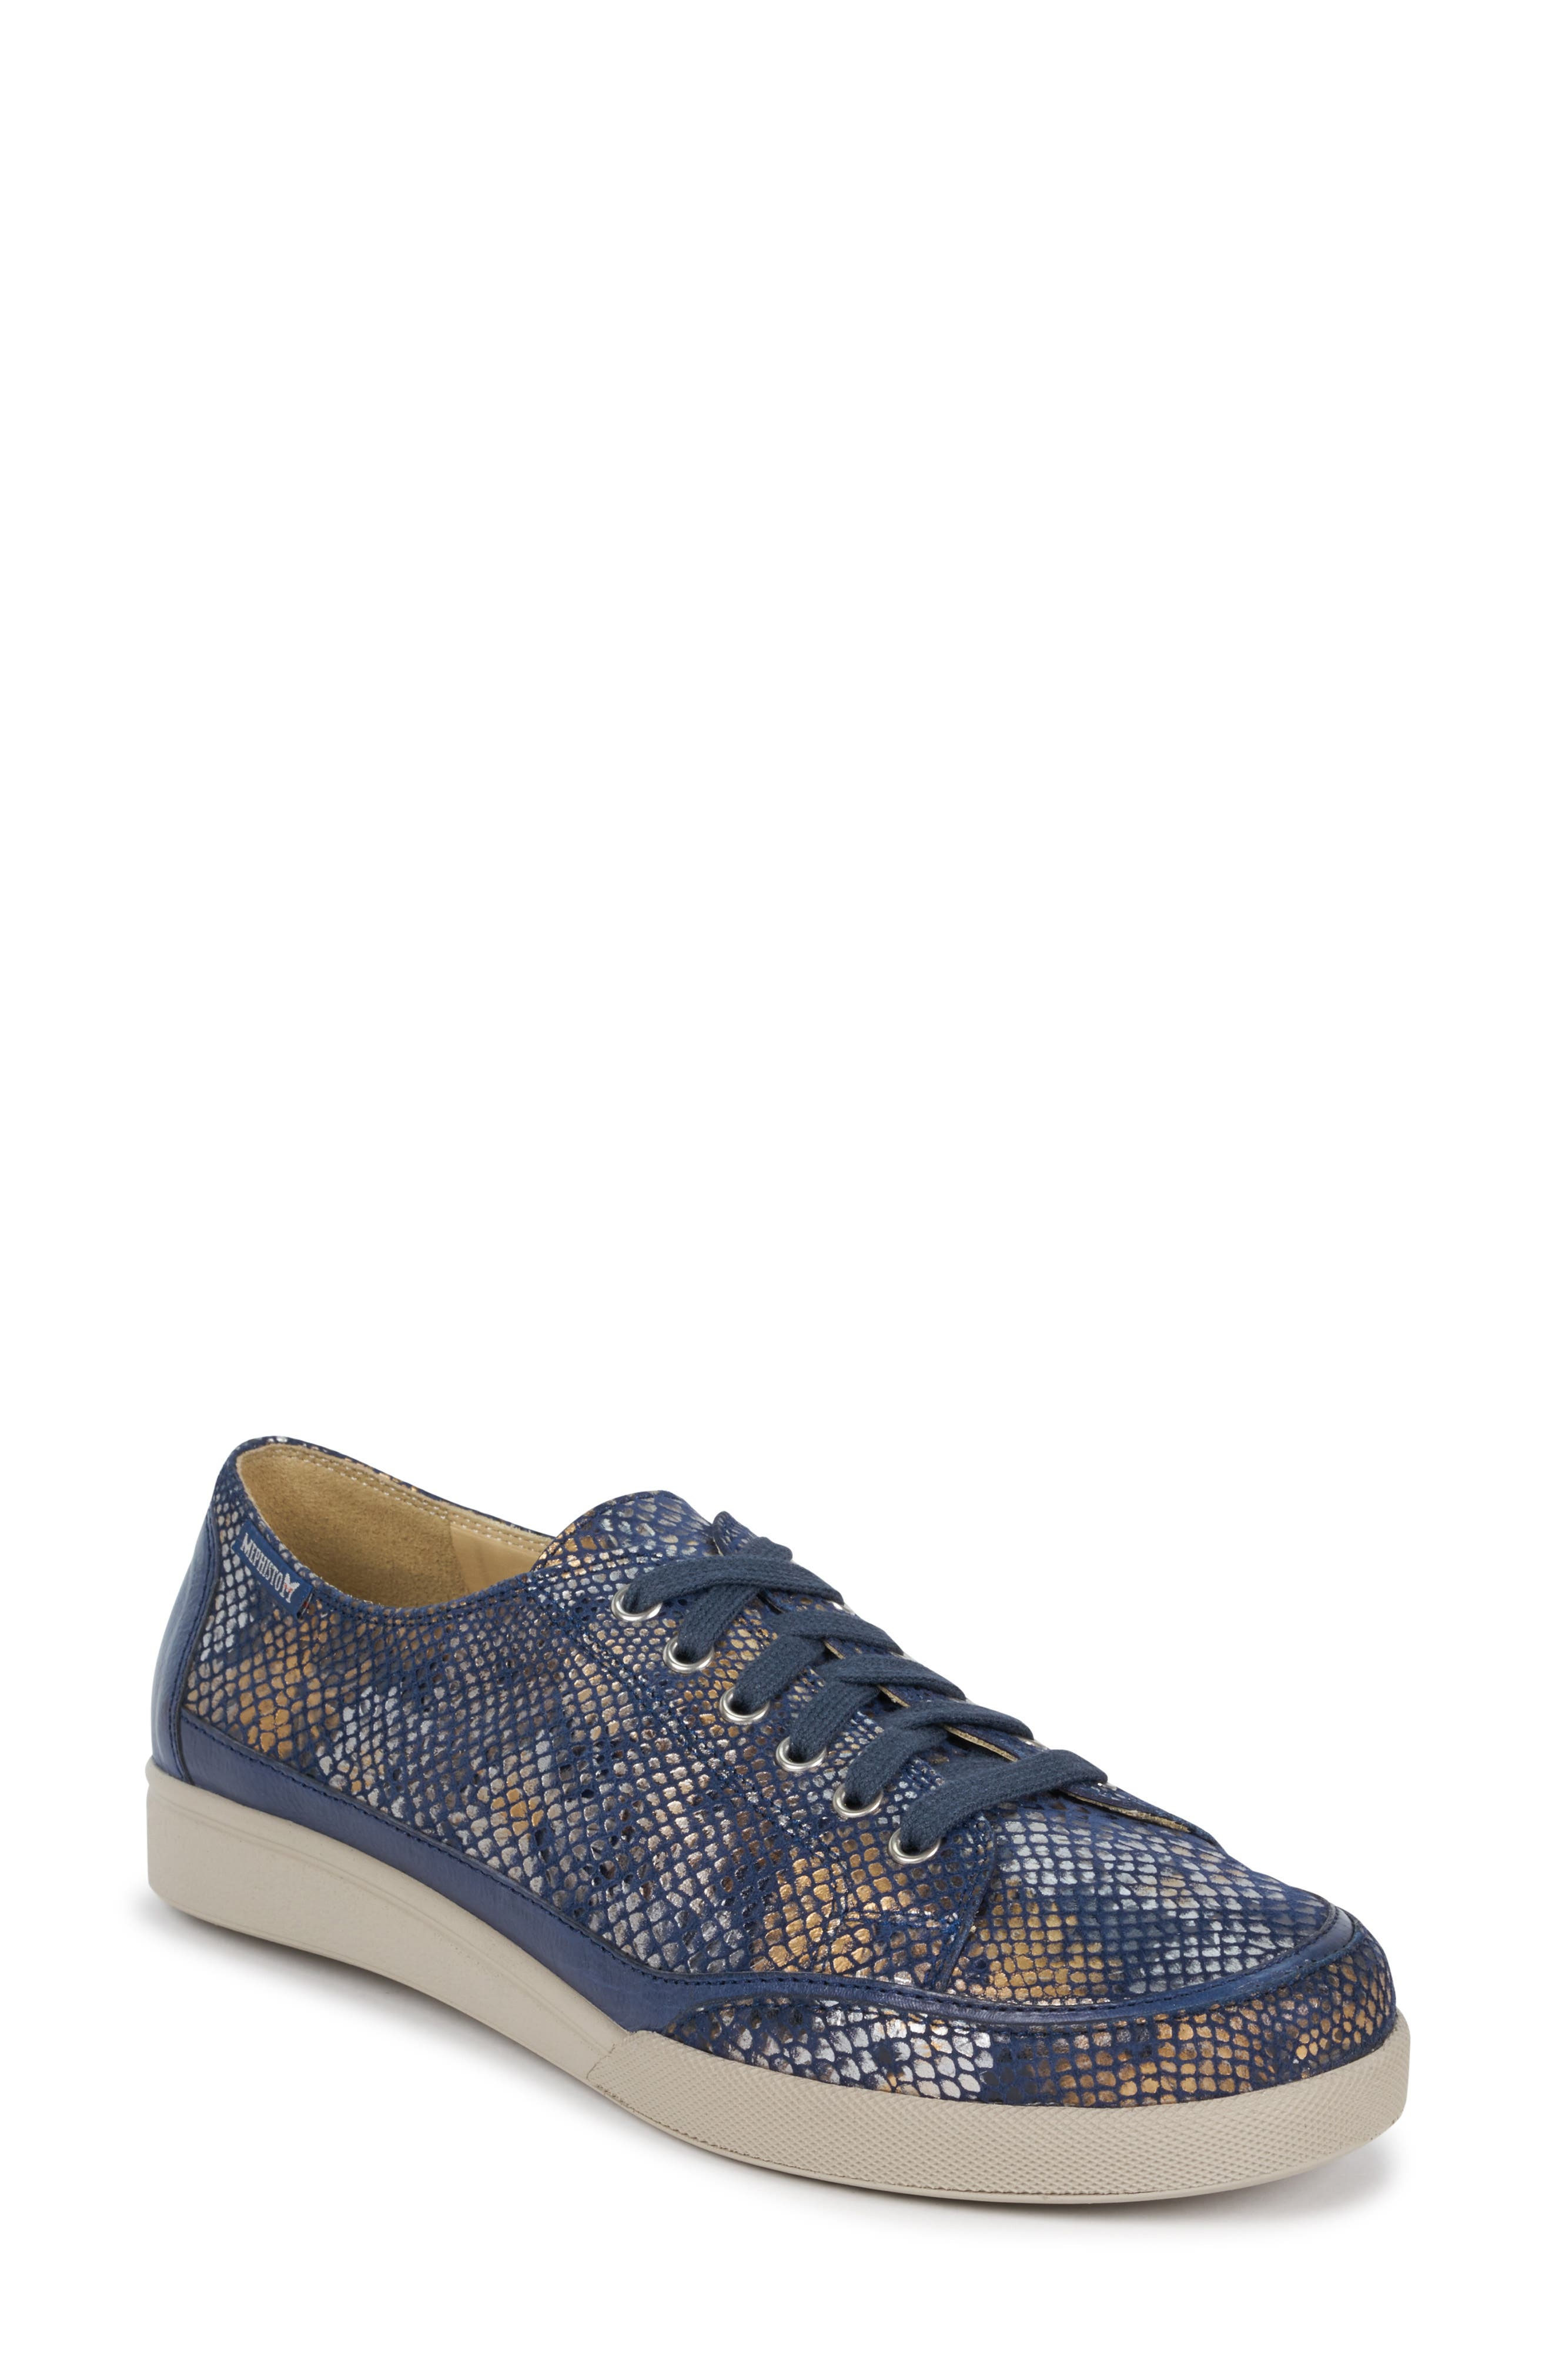 Mephisto Delya Sneaker, Blue